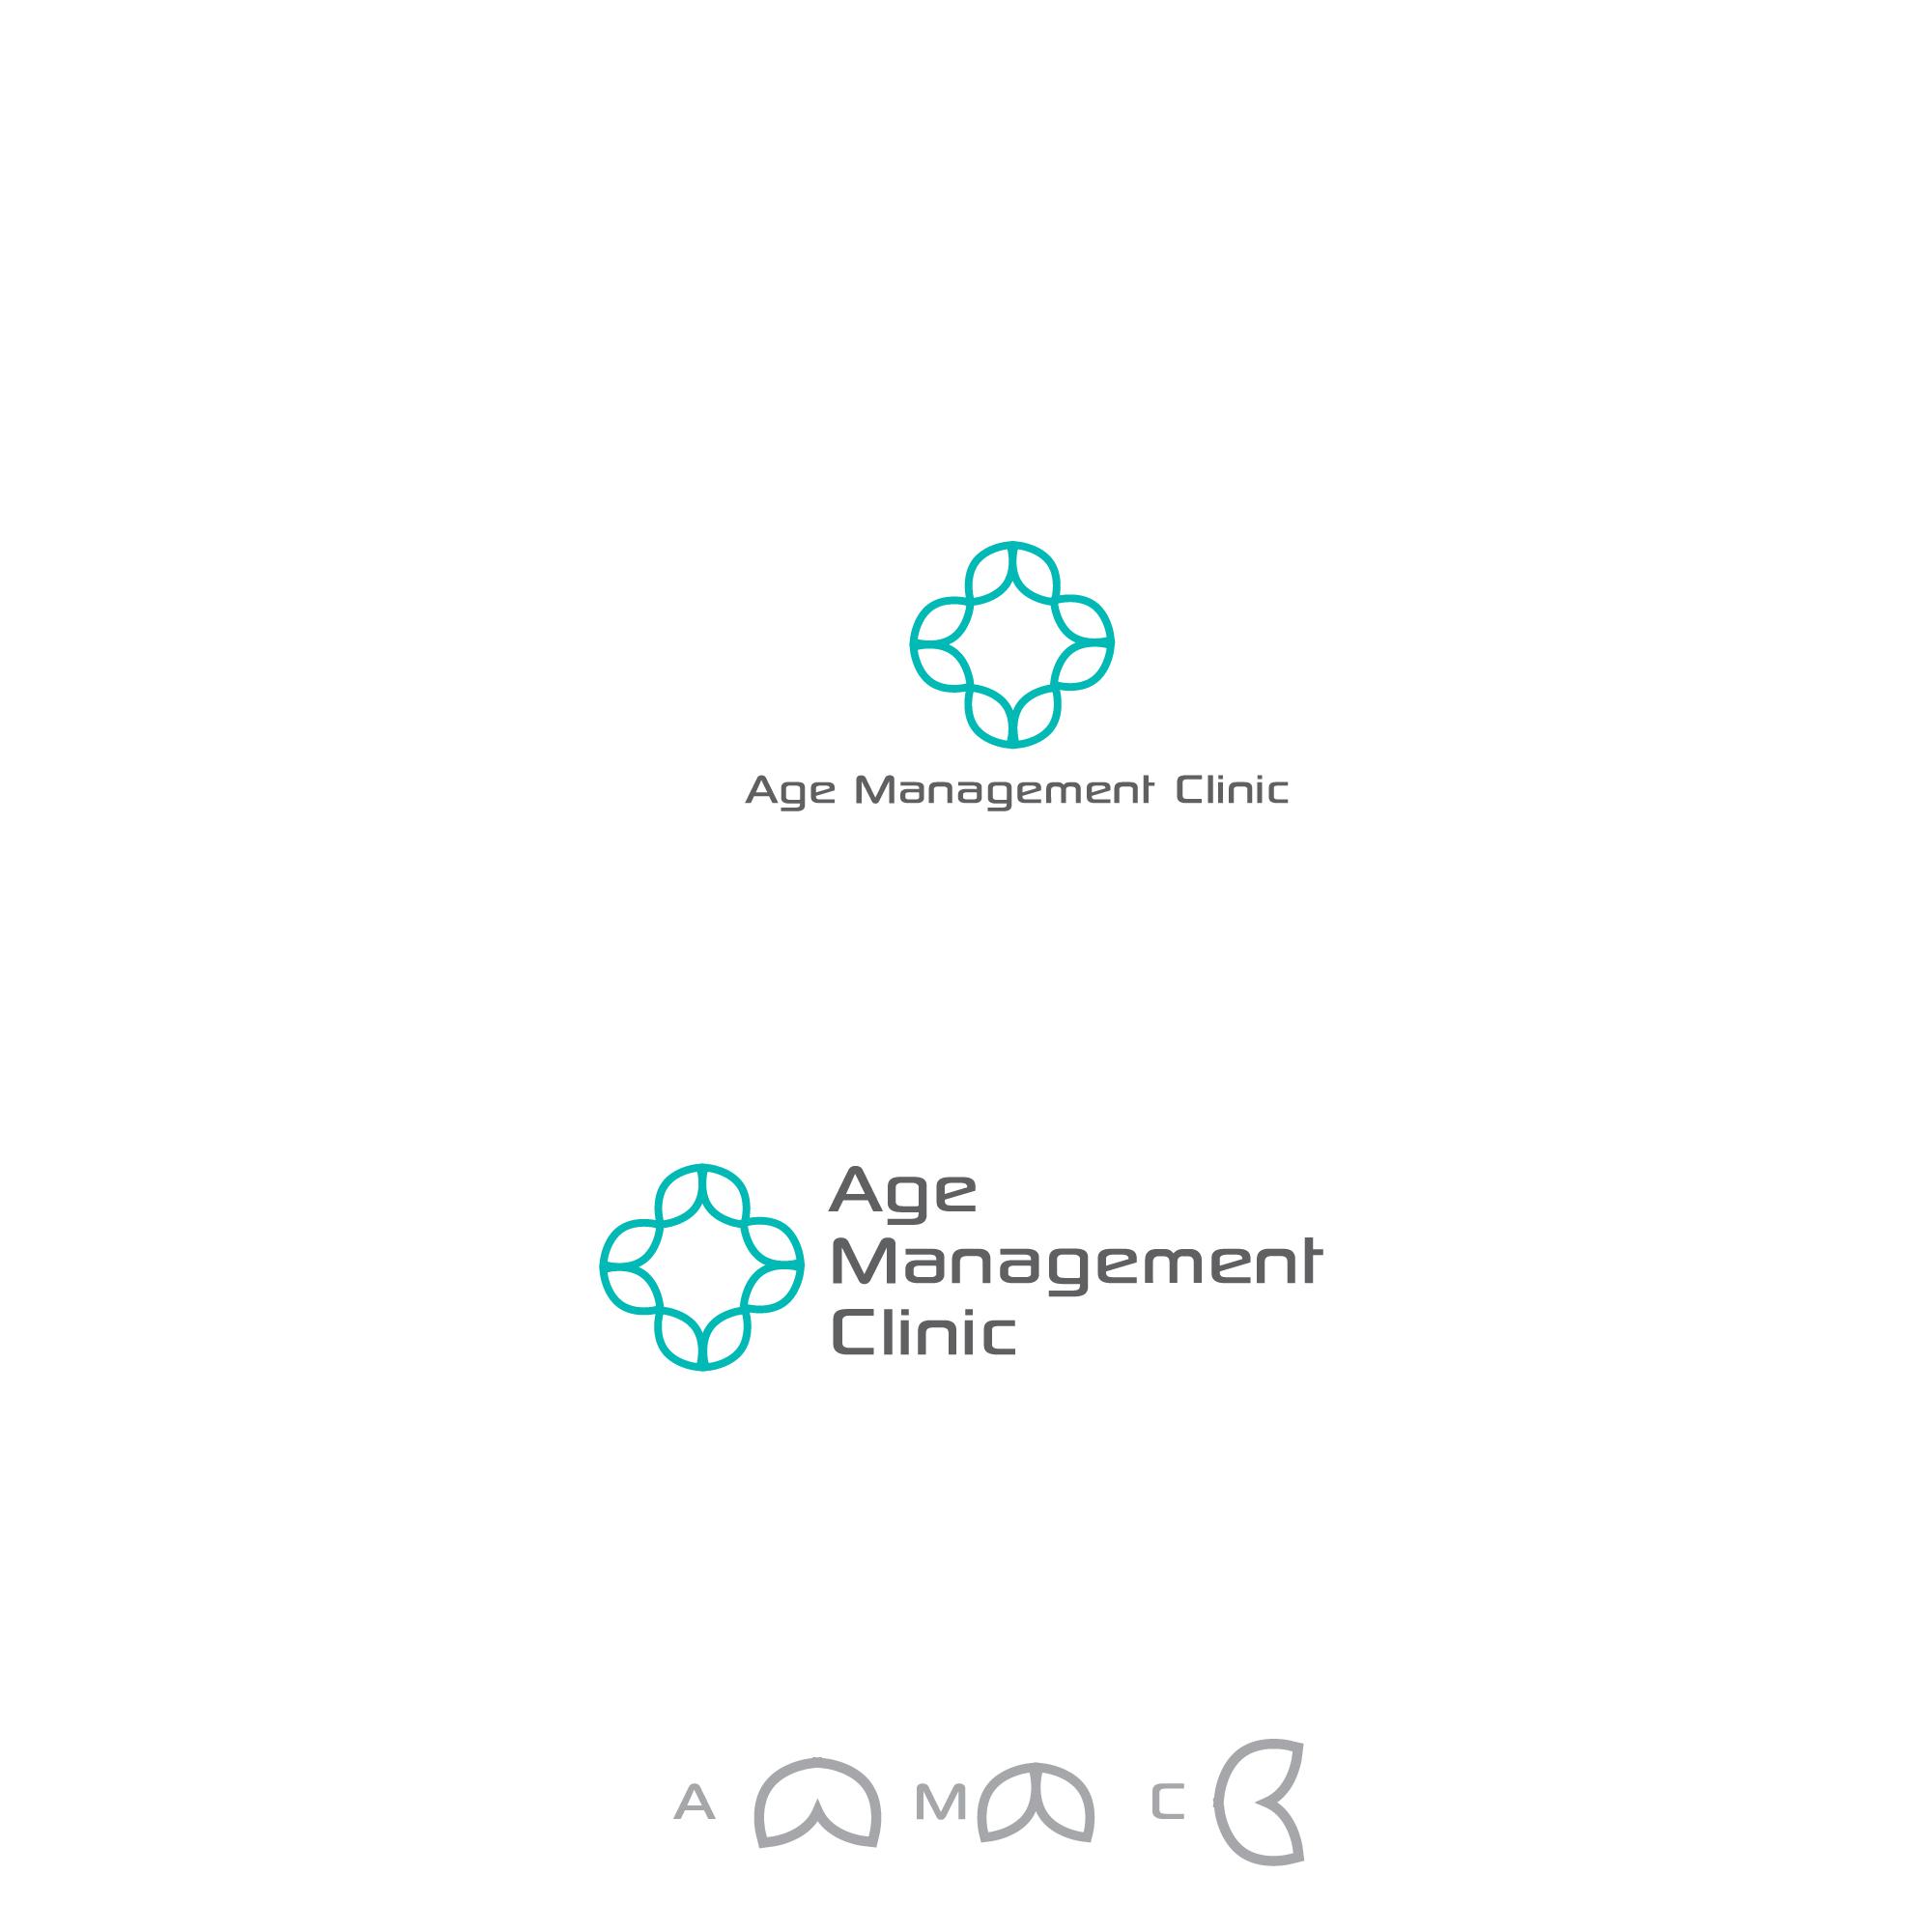 Логотип для медицинского центра (клиники)  фото f_4215b98e676a19a6.jpg